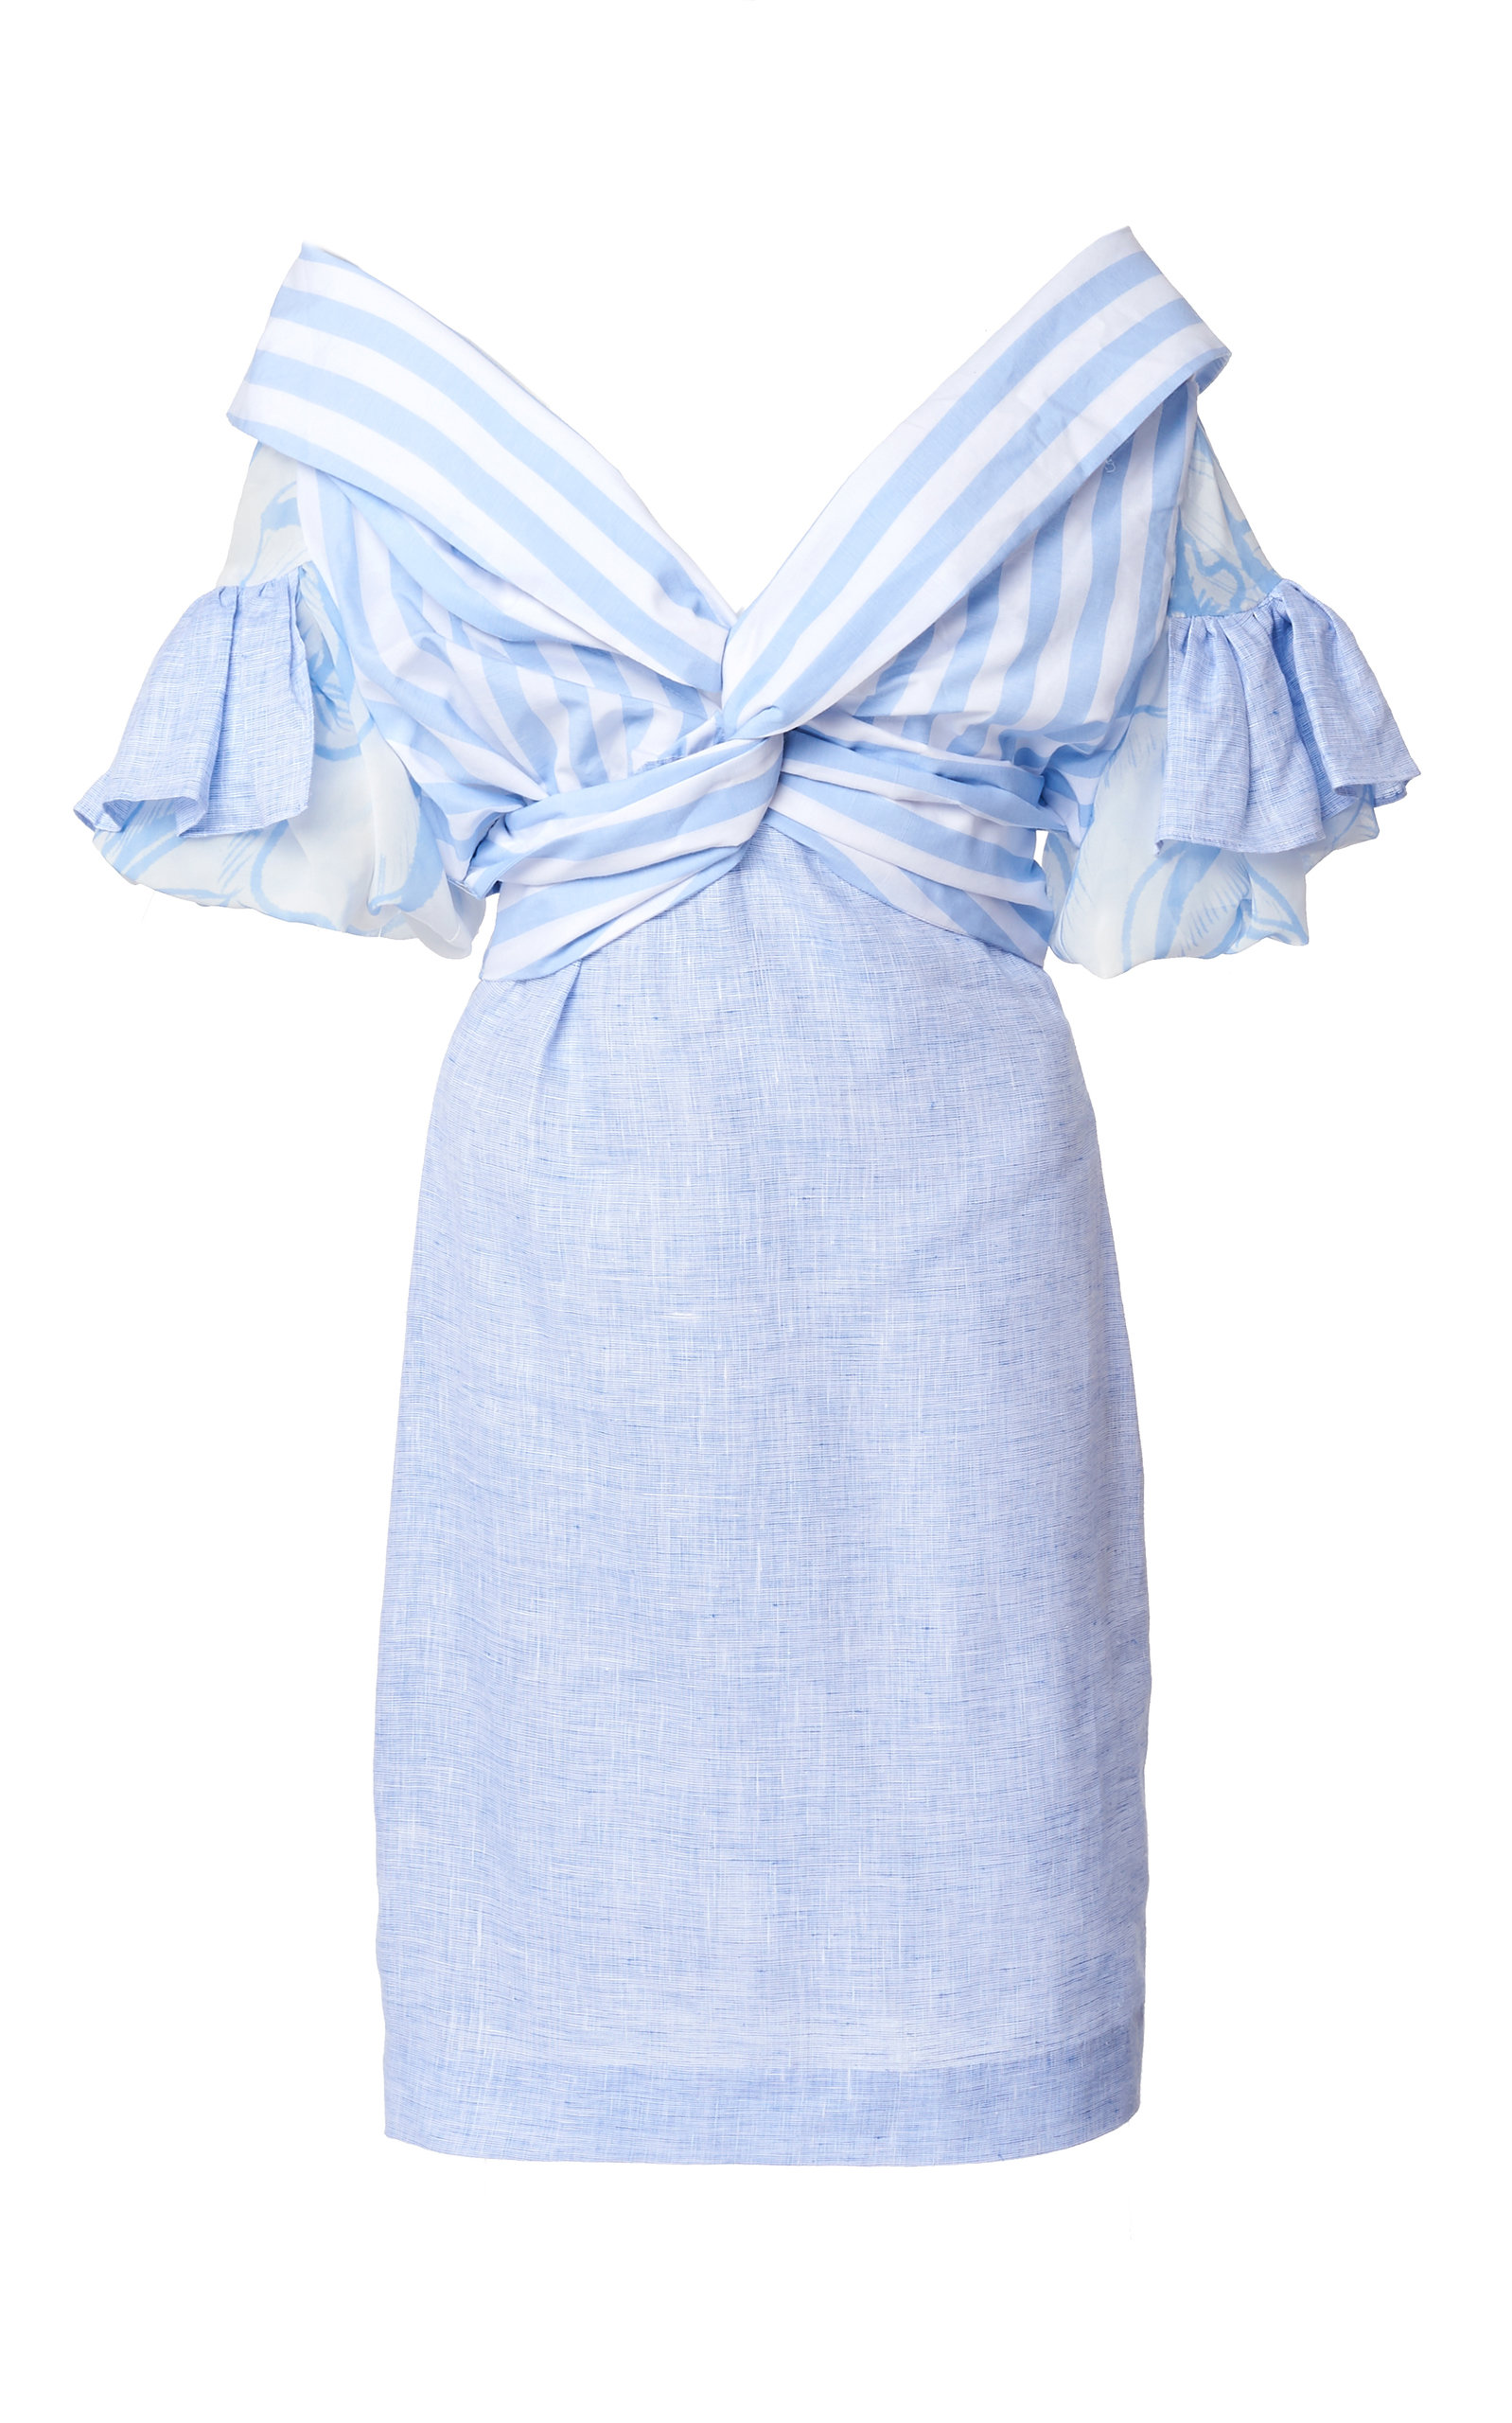 Buy Leal Daccarett Cielo Lindo Striped Linen-Blend Dress online, shop Leal Daccarett at the best price